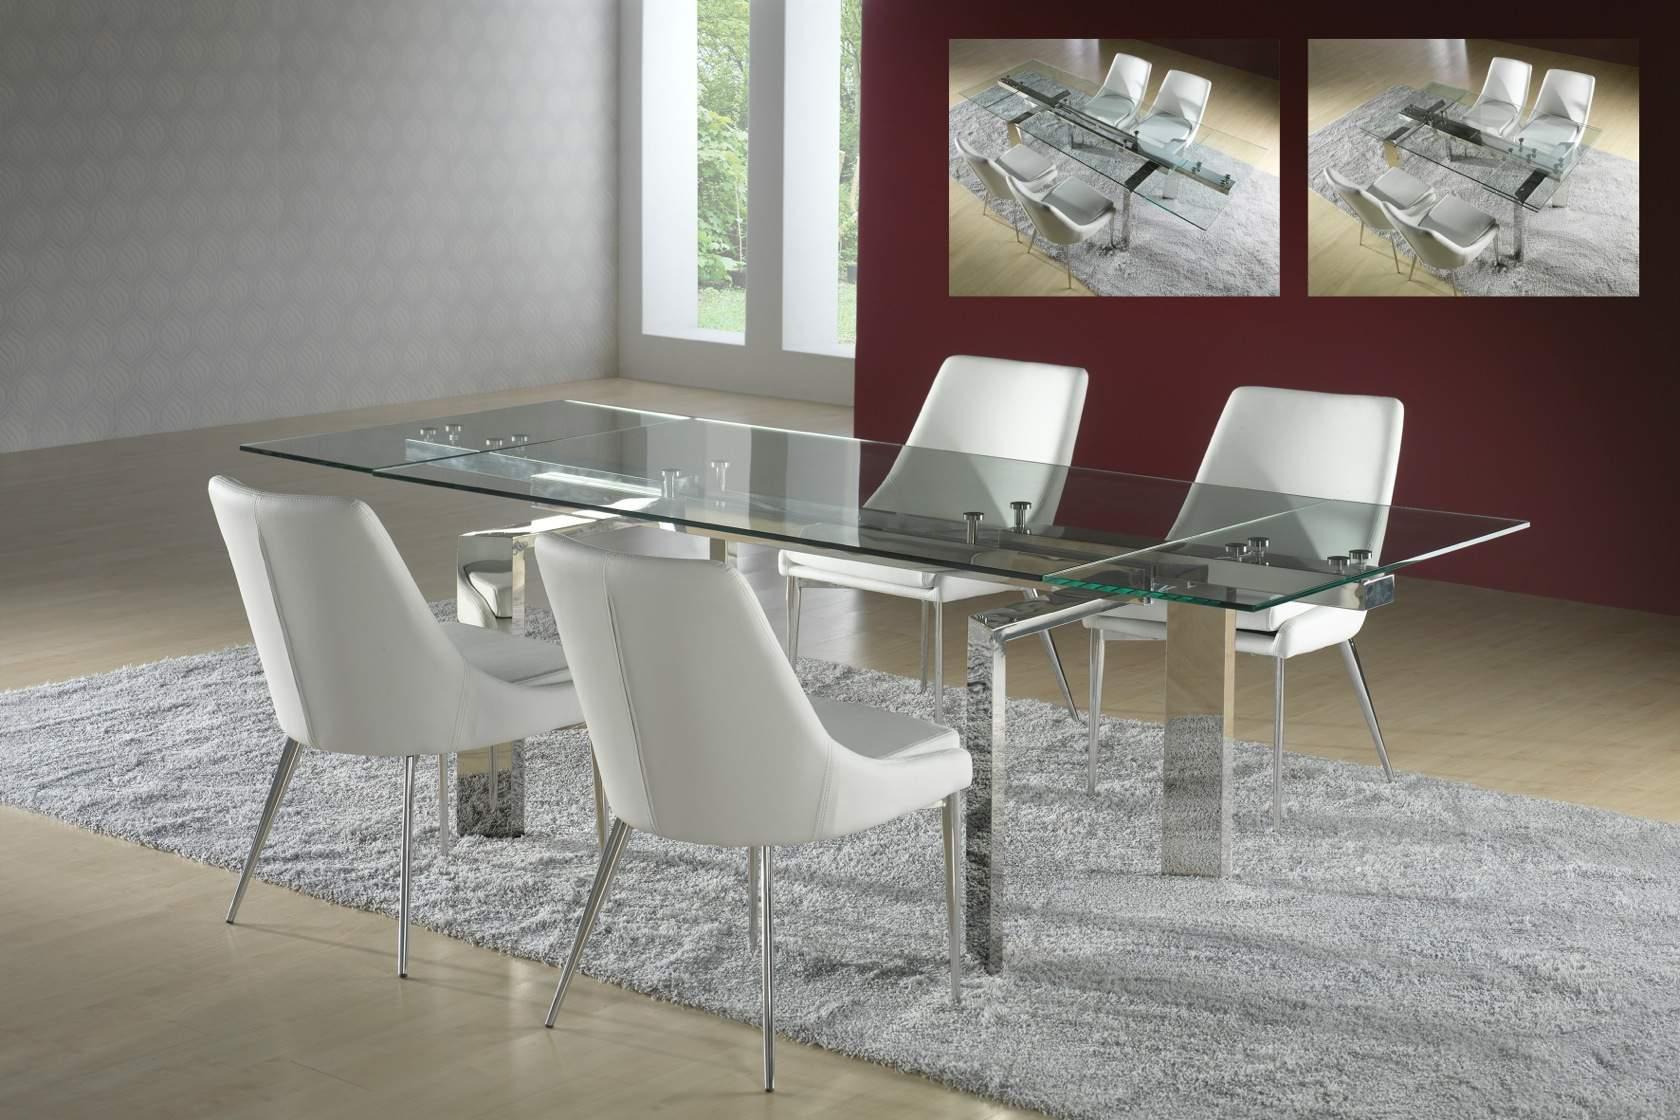 Dublin mesa de comedor extensible 160x78,5x90cm Acero y cristal